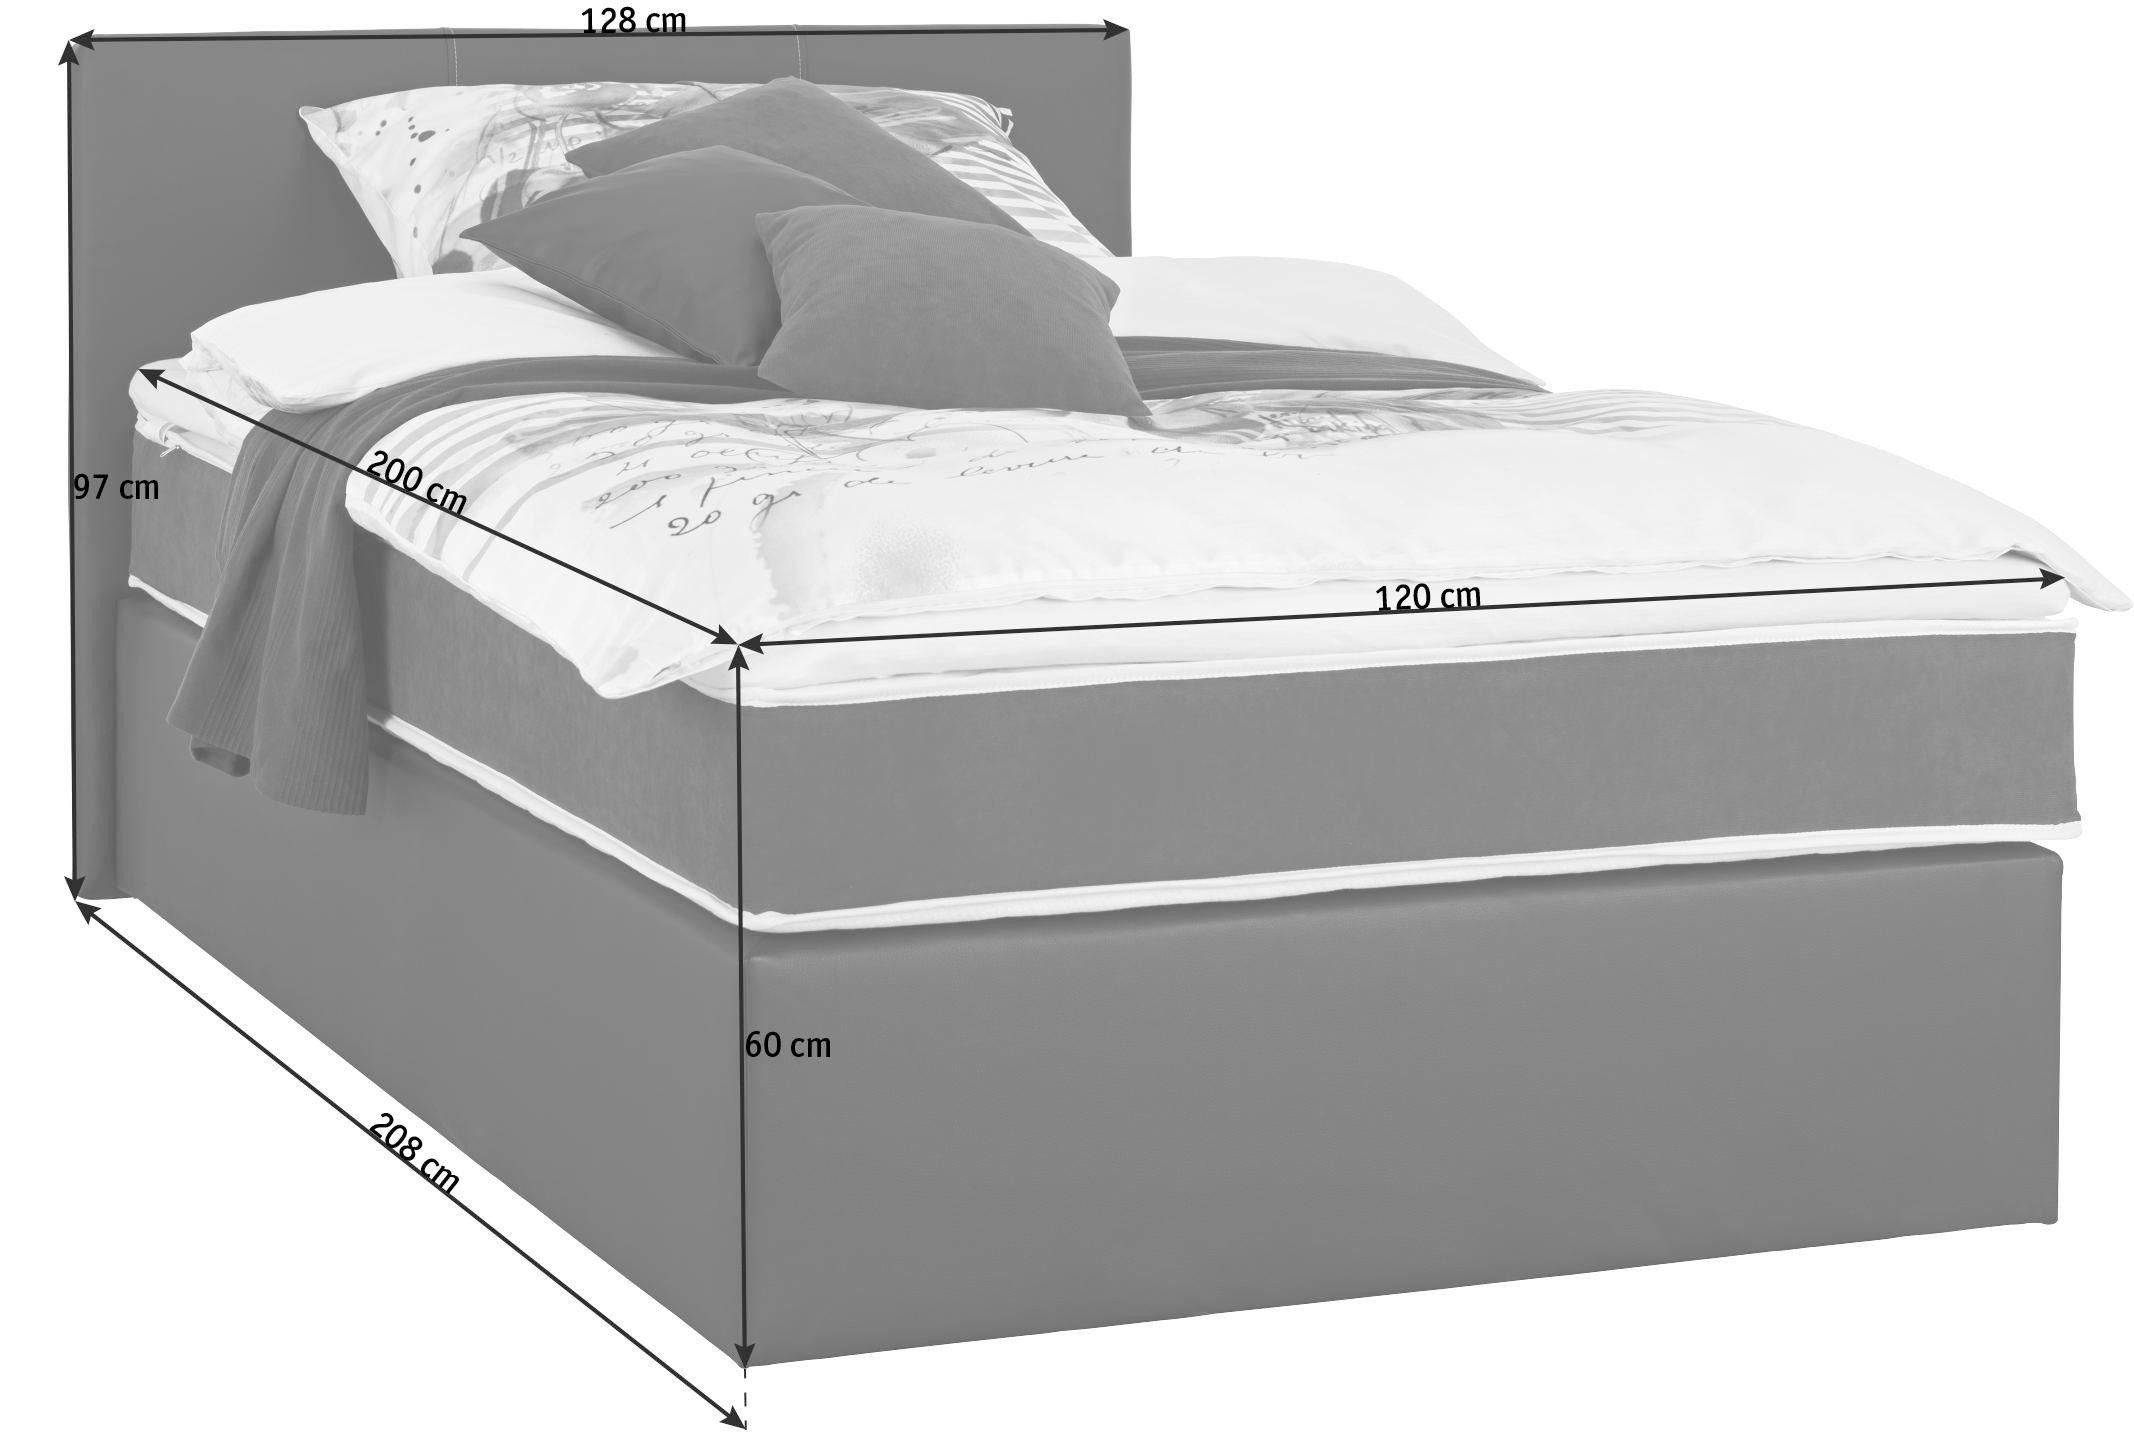 KONTINENTALSÄNG - svart, Design, textil (120/200cm) - Low Price